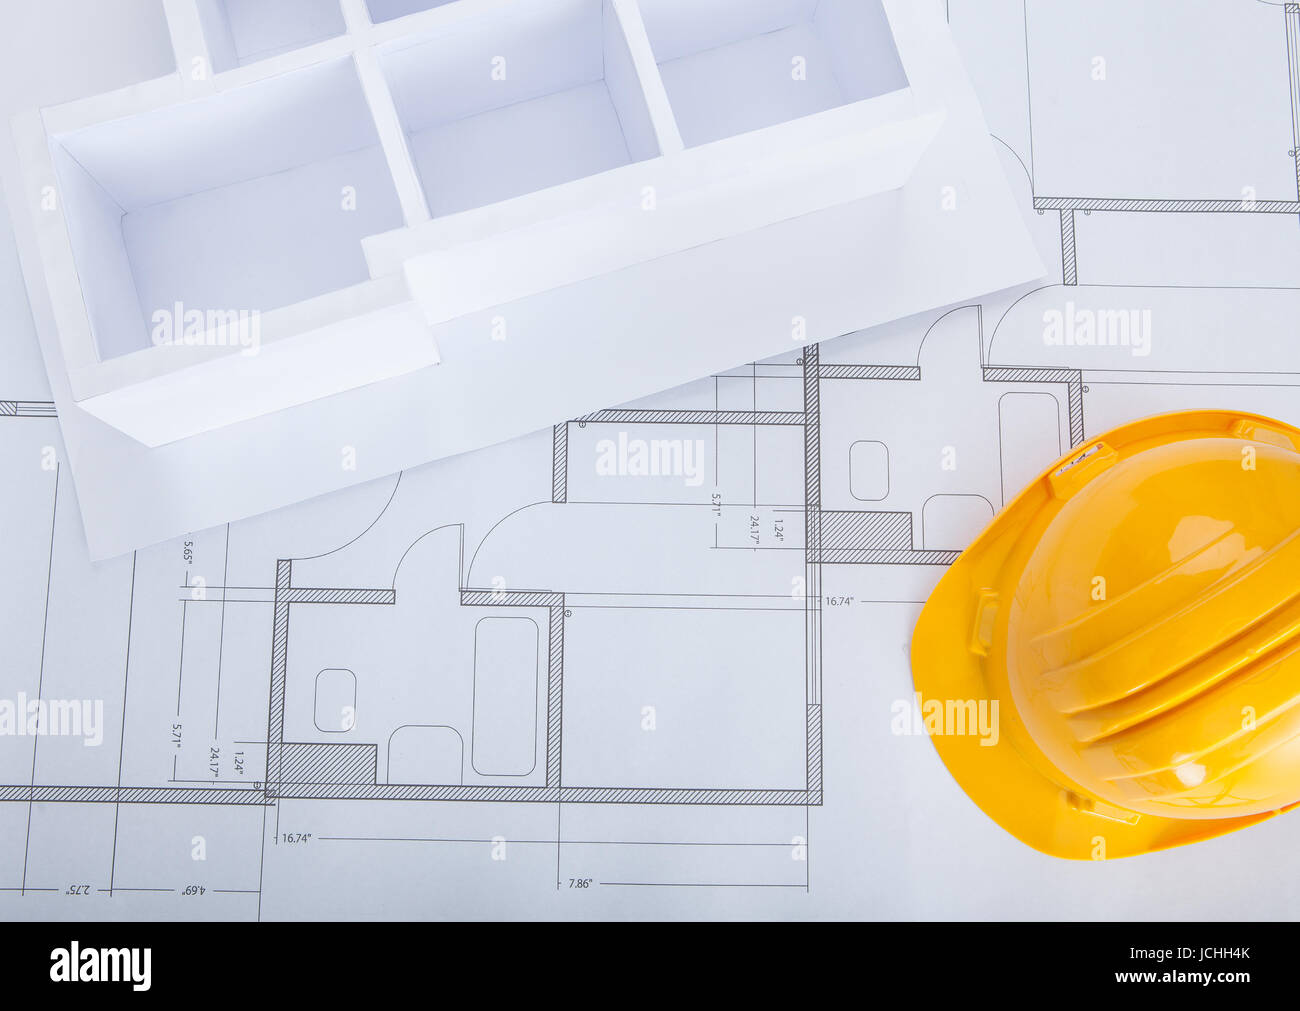 High angle view of house model on blueprint with hardhat stock photo high angle view of house model on blueprint with hardhat malvernweather Choice Image